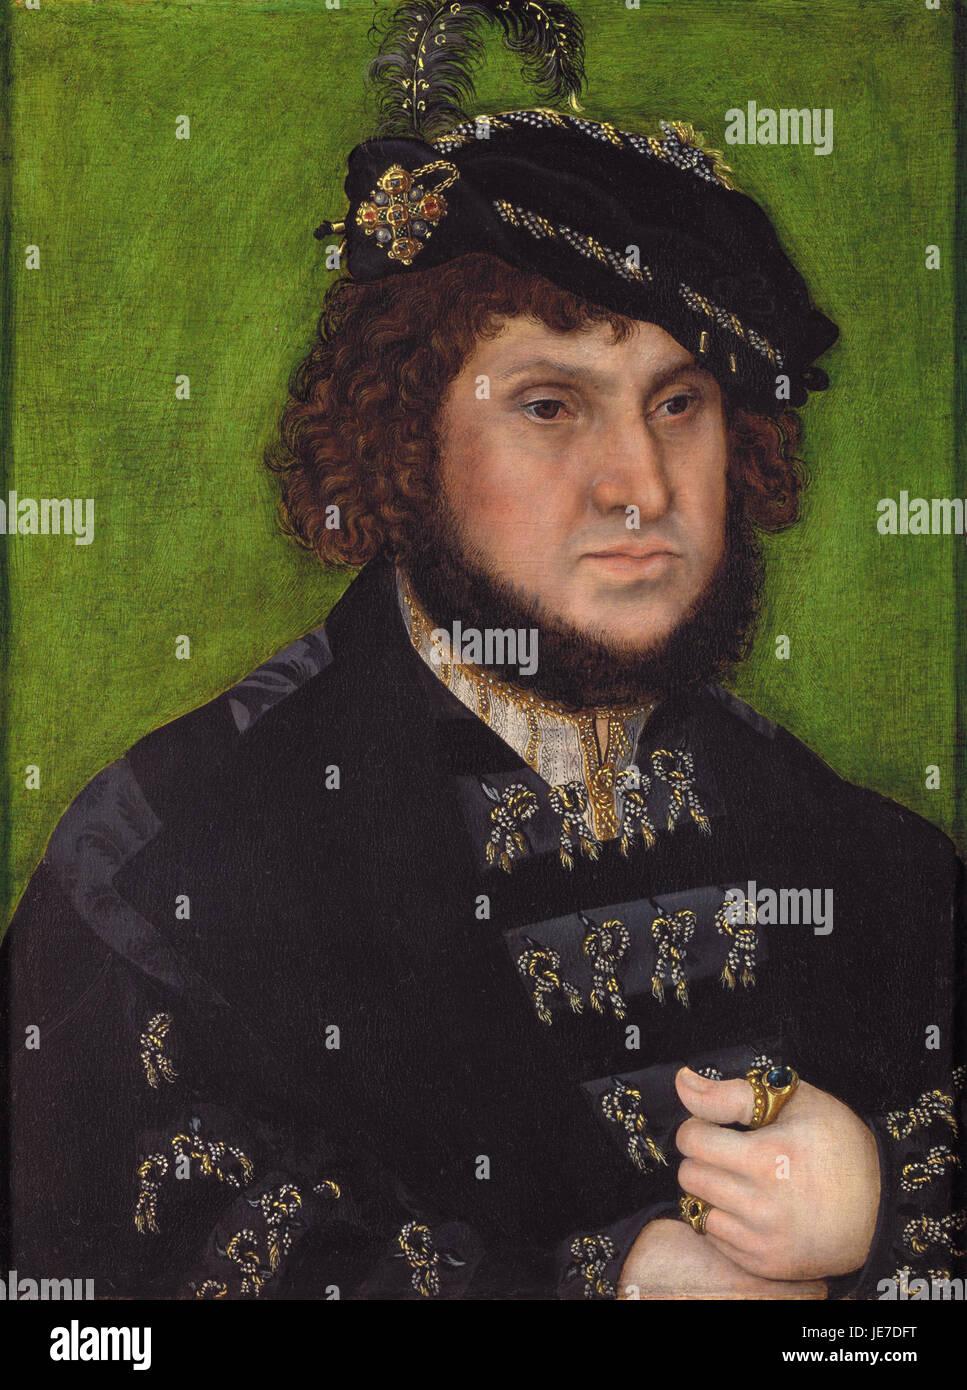 Lucas Cranach the Elder - Portrait of Johann the Steadfast 1509 - Stock Image